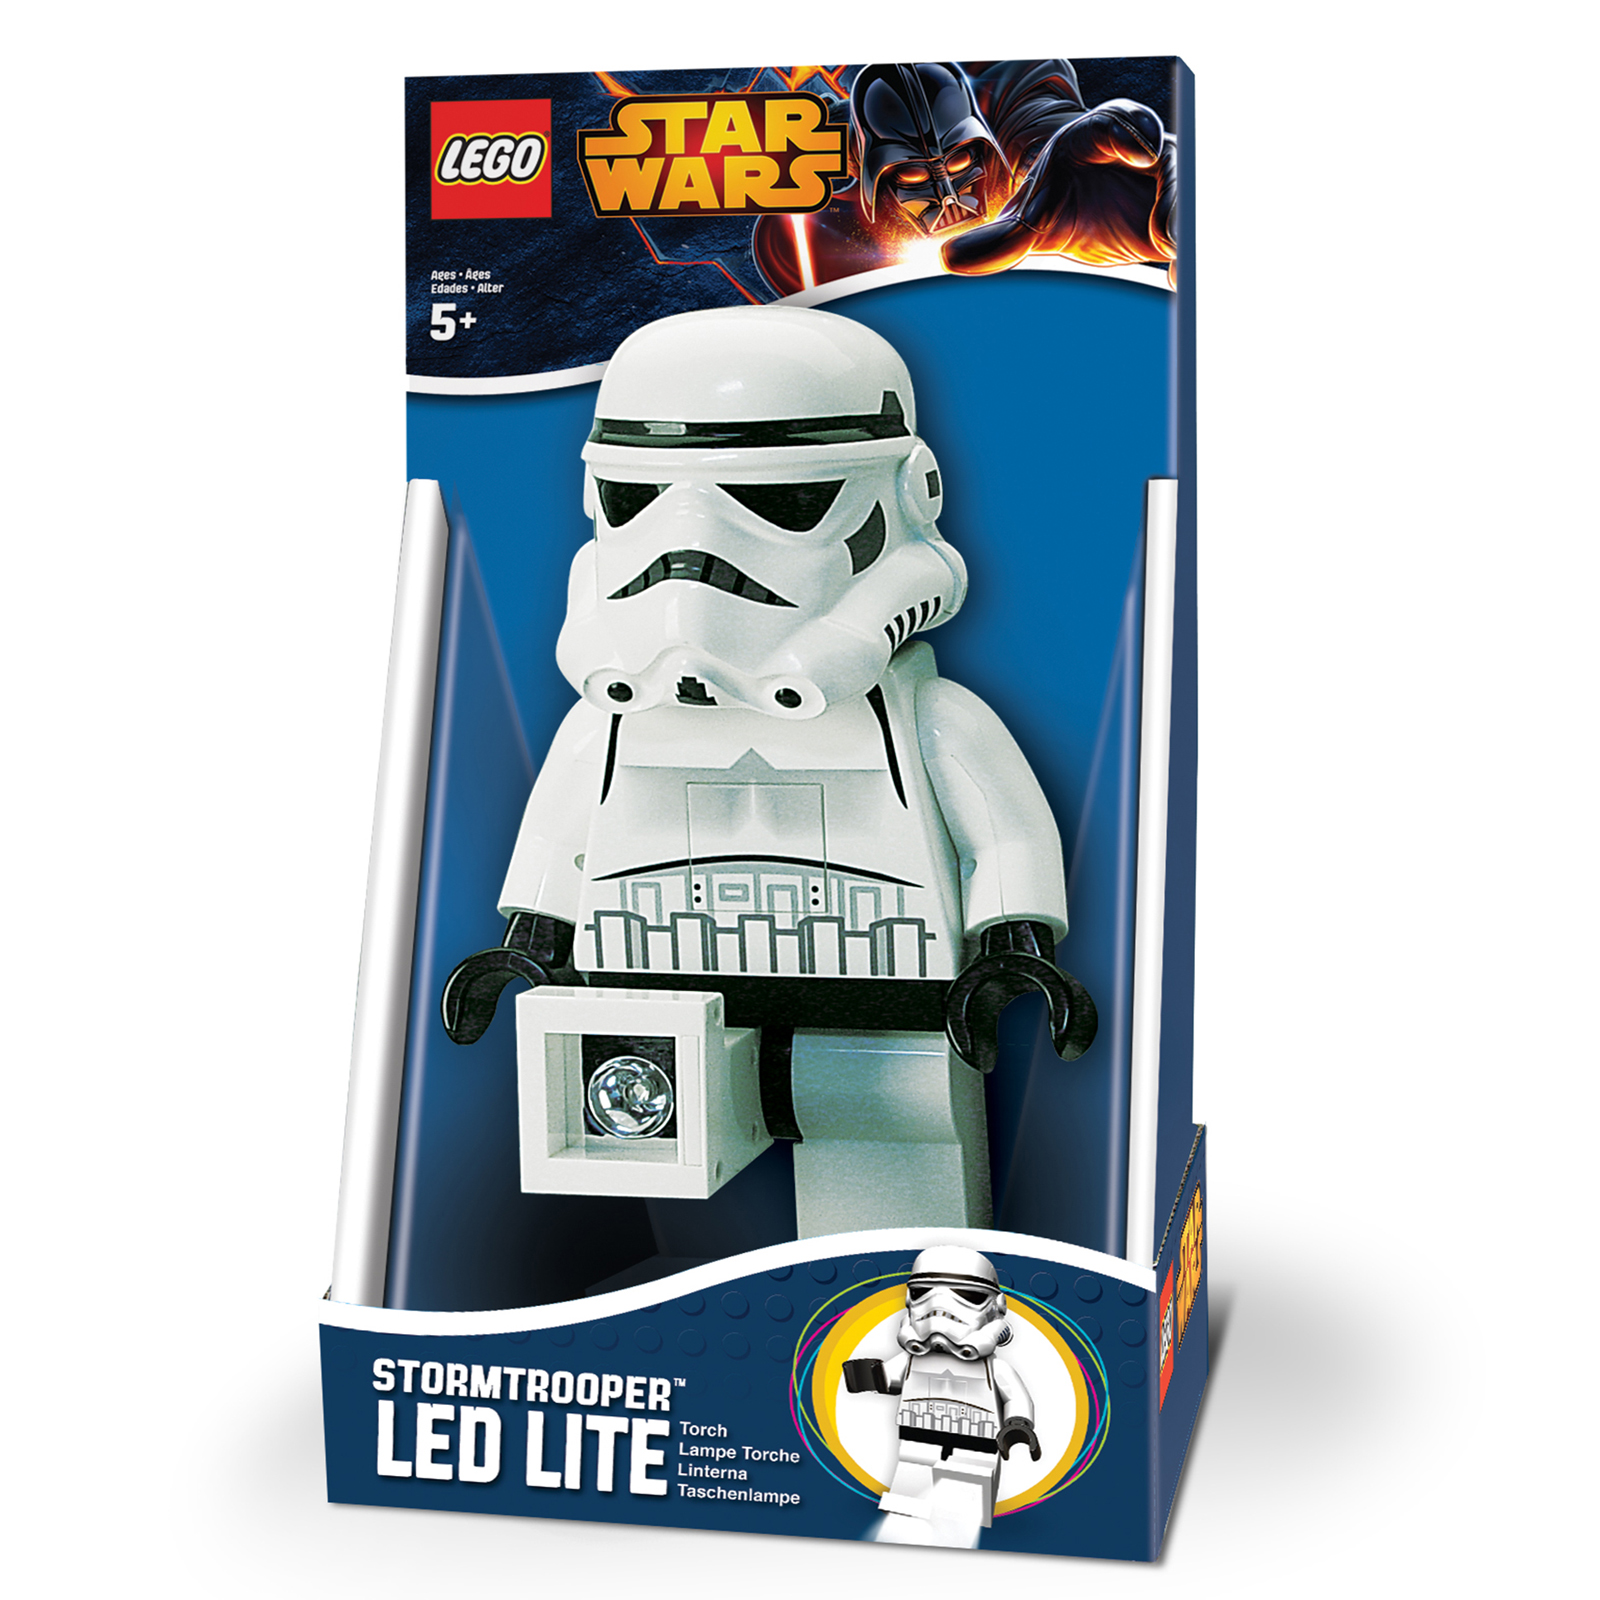 Lego Star Wars LED Light Torcia Darth Vader Stormtrooper Mini Figurina ...